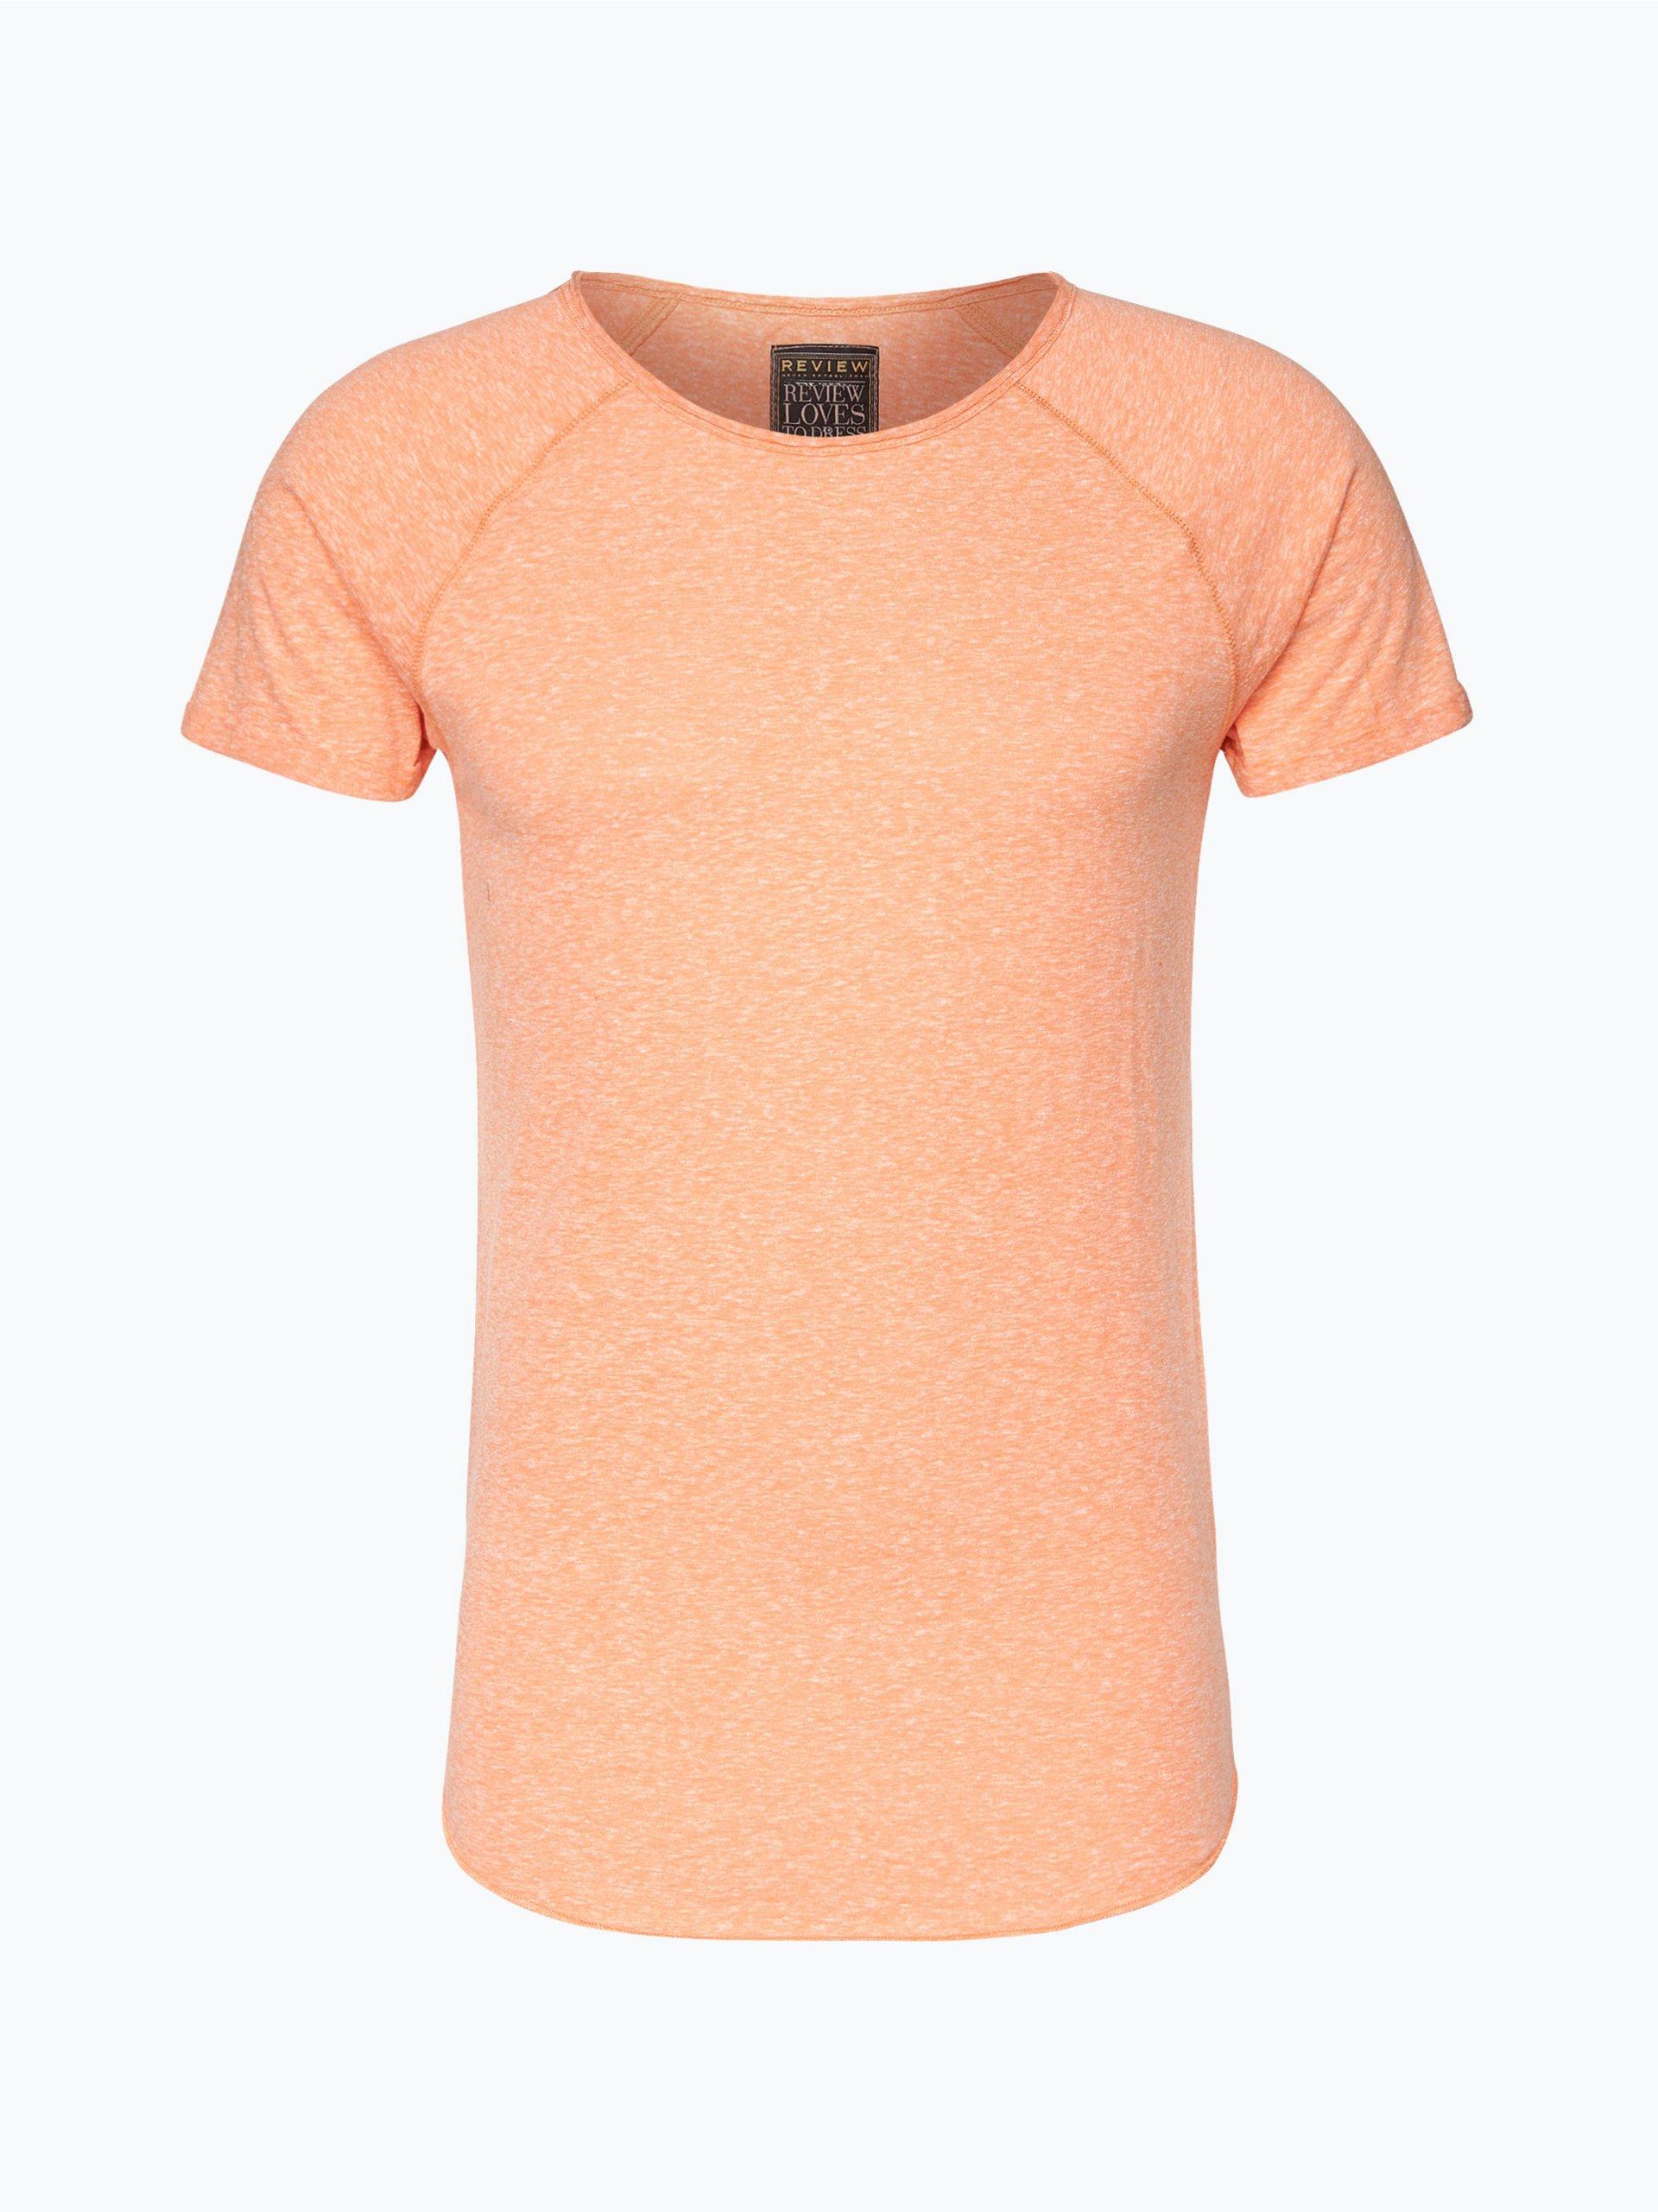 review herren t shirt orange uni online kaufen vangraaf com. Black Bedroom Furniture Sets. Home Design Ideas